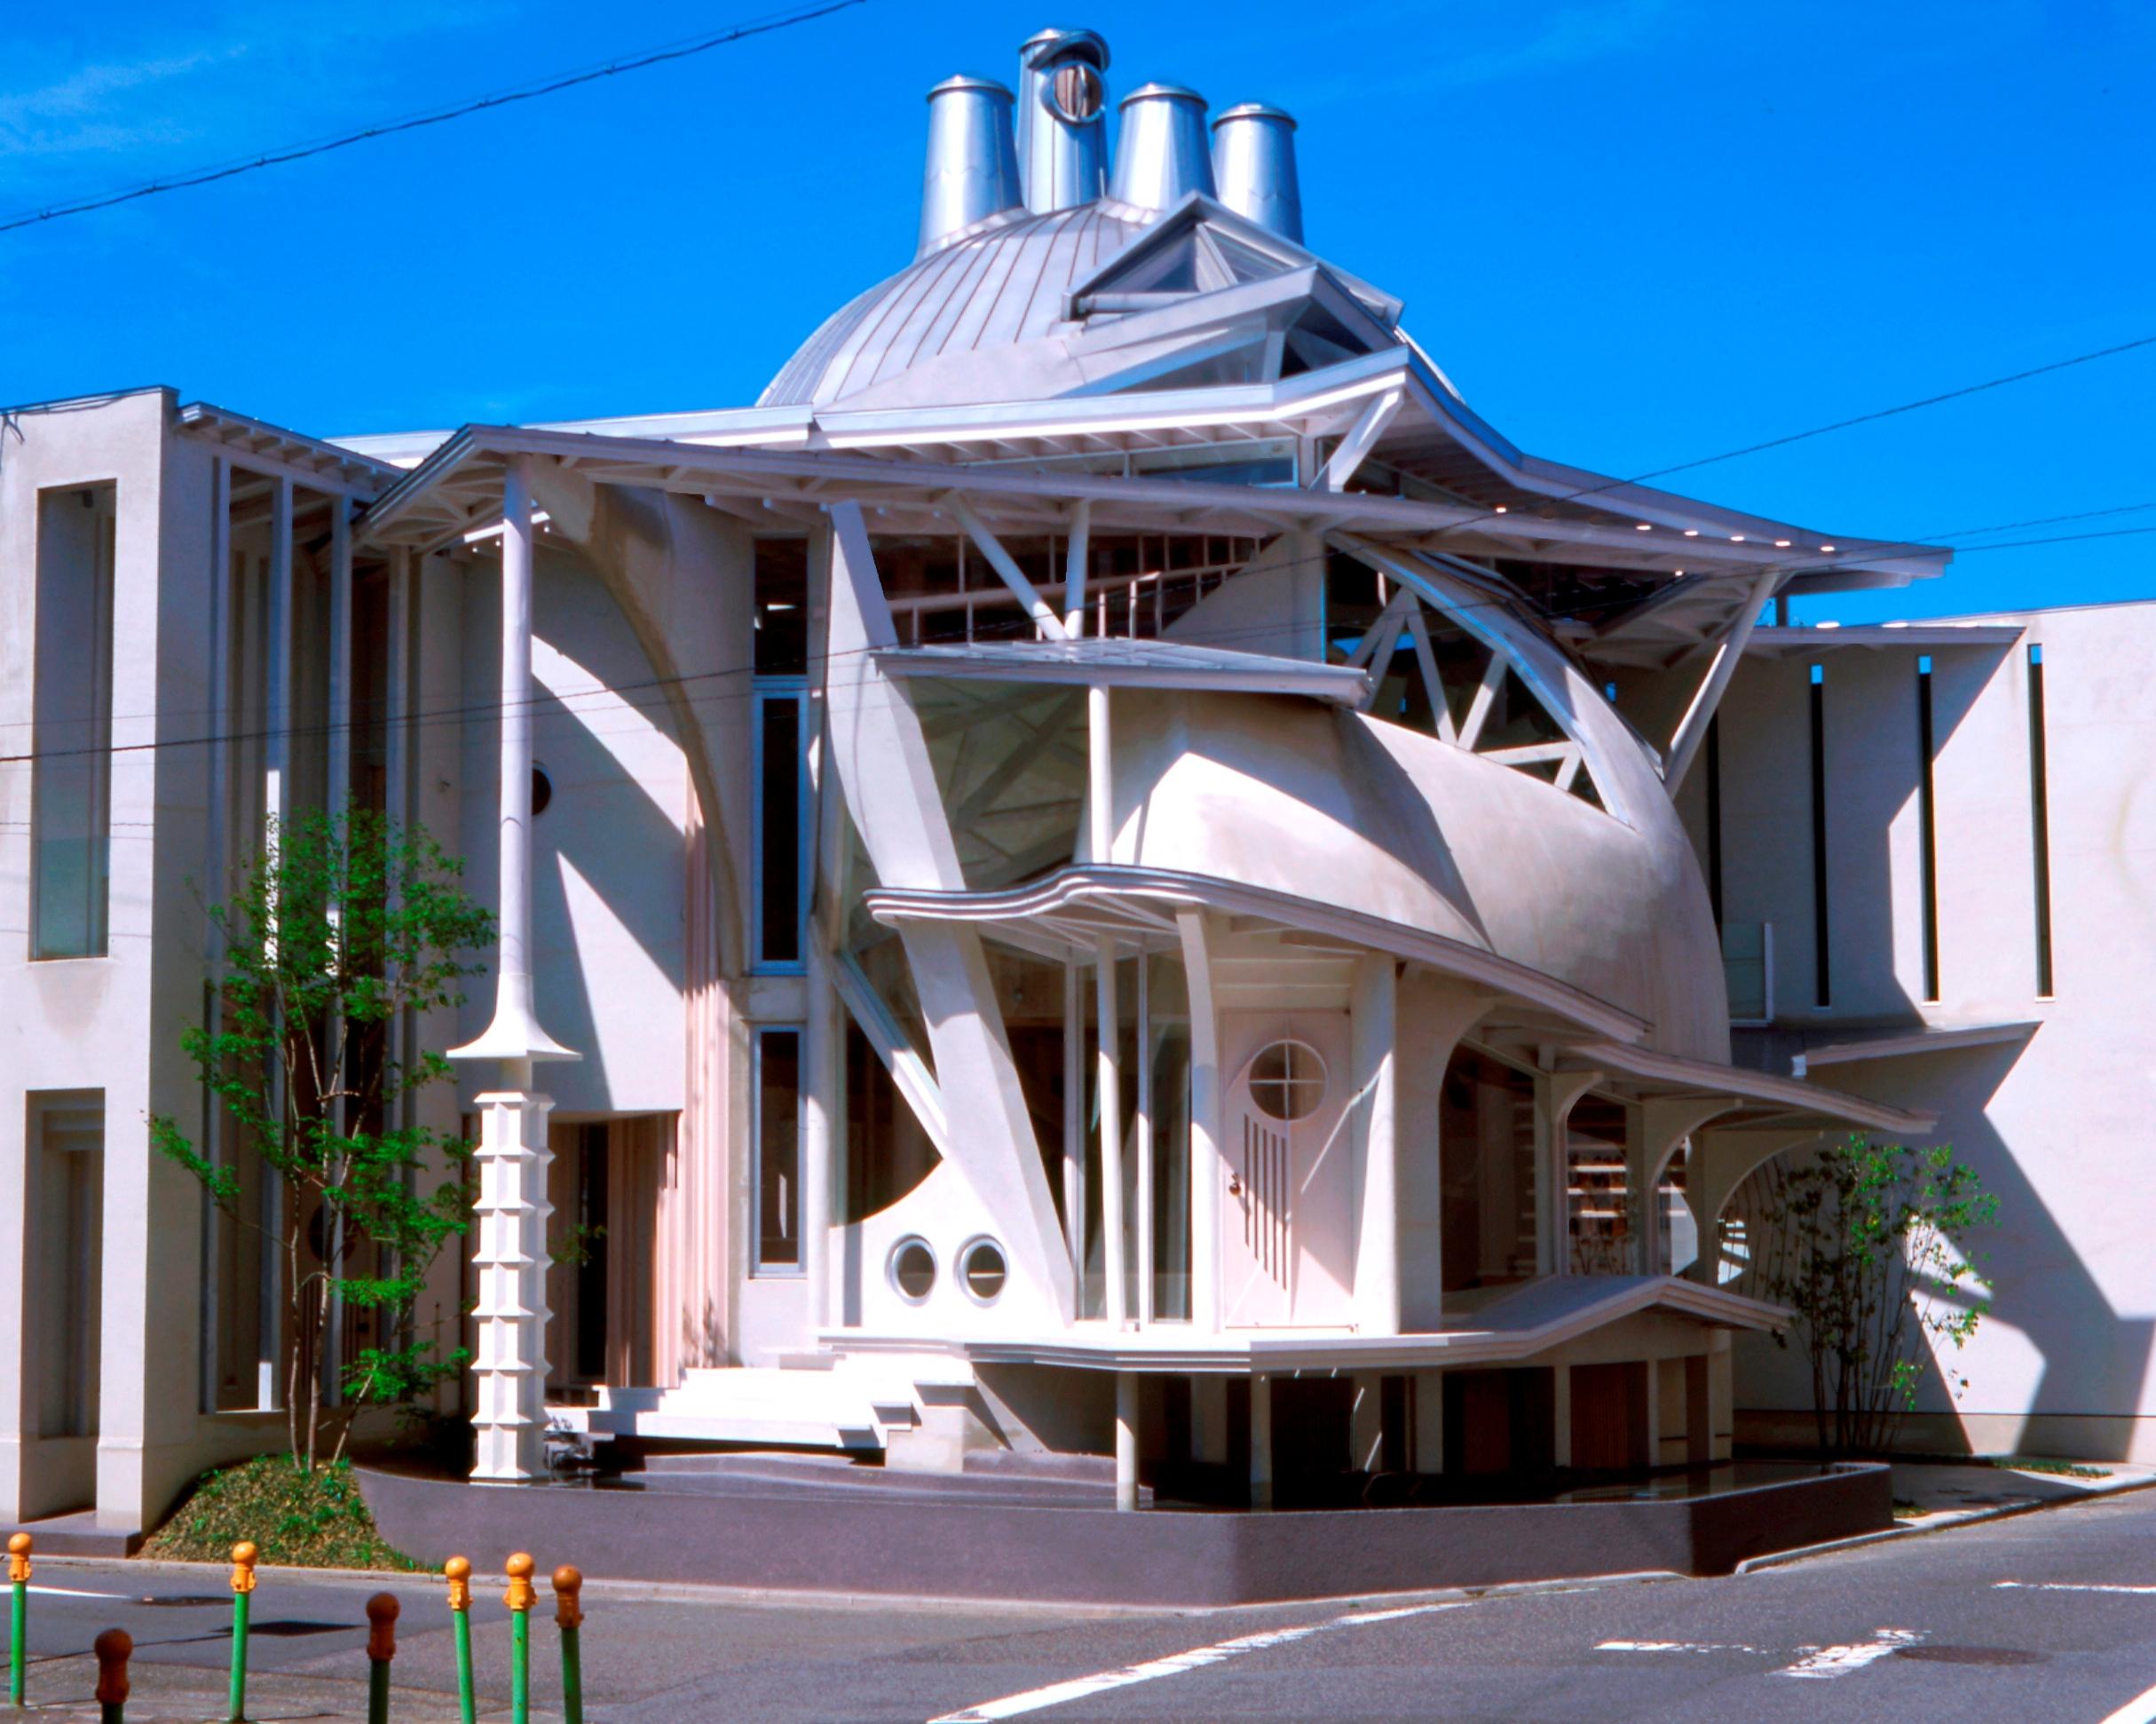 File:天地のいえ - Tenchi House - MONO COSMOLOGY.jpg - Wikimedia ...